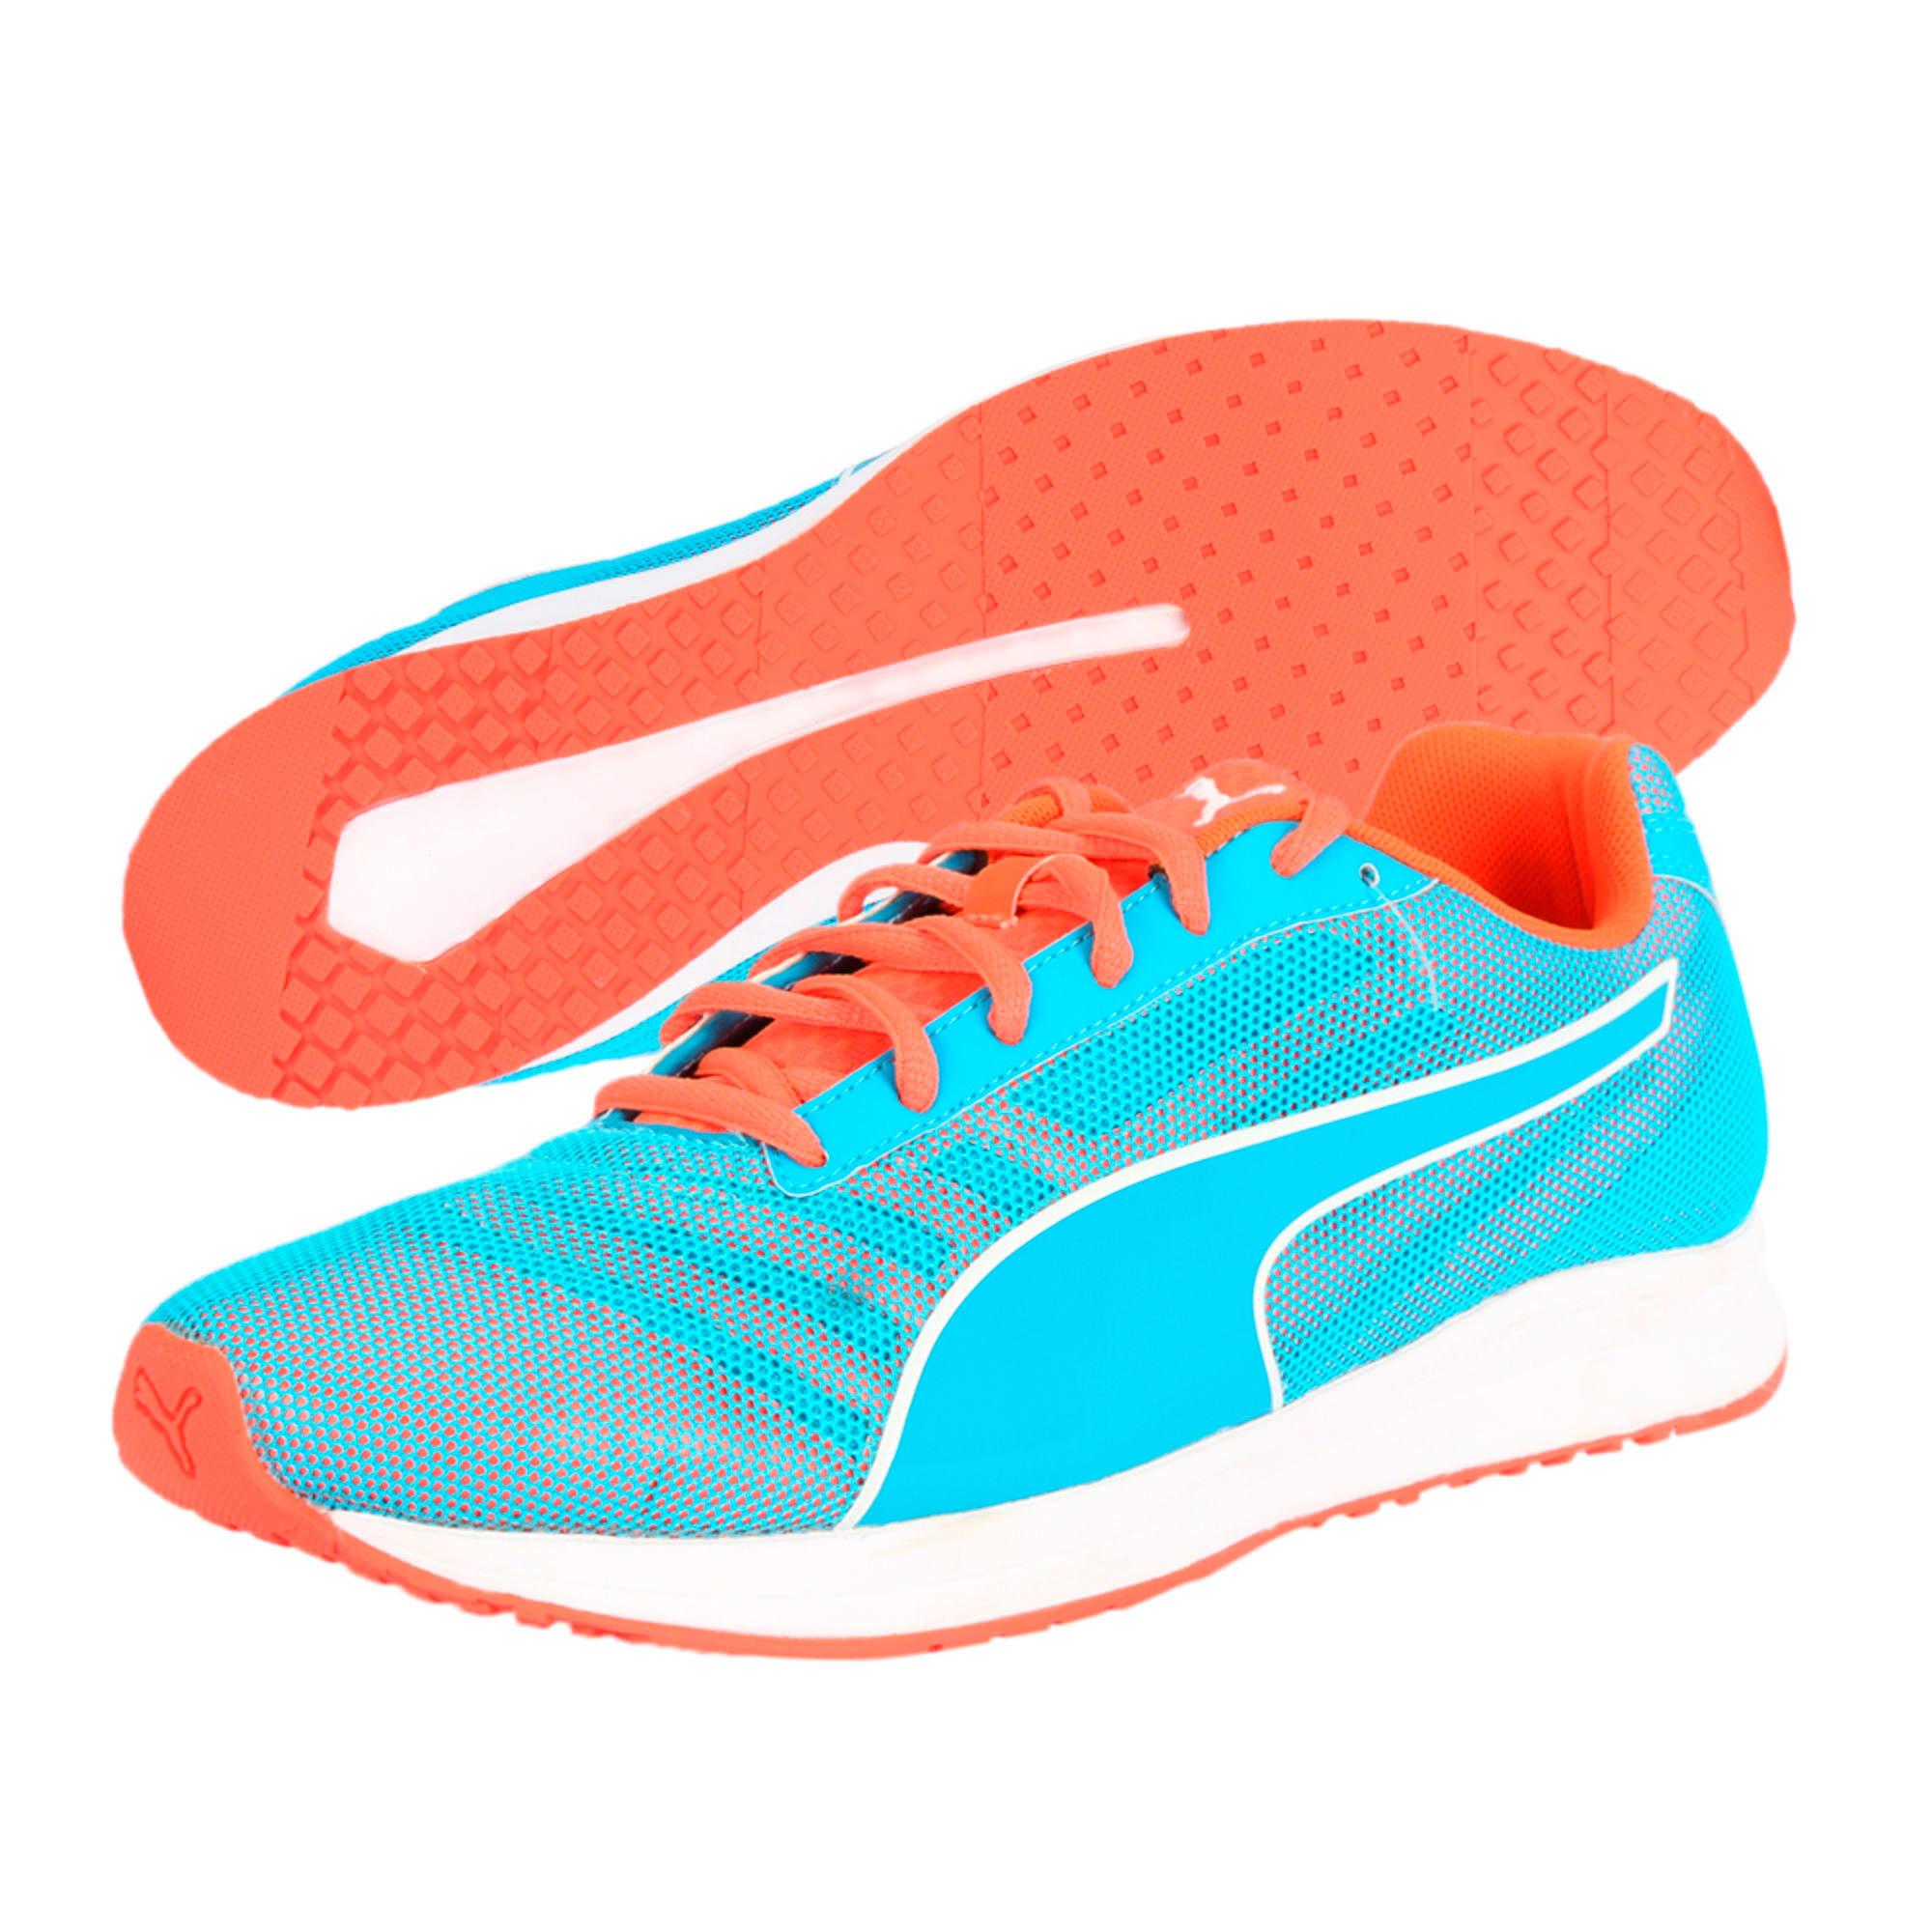 Thumbnail 6 of Burst Running Shoes, atomic blue-red blast, medium-IND